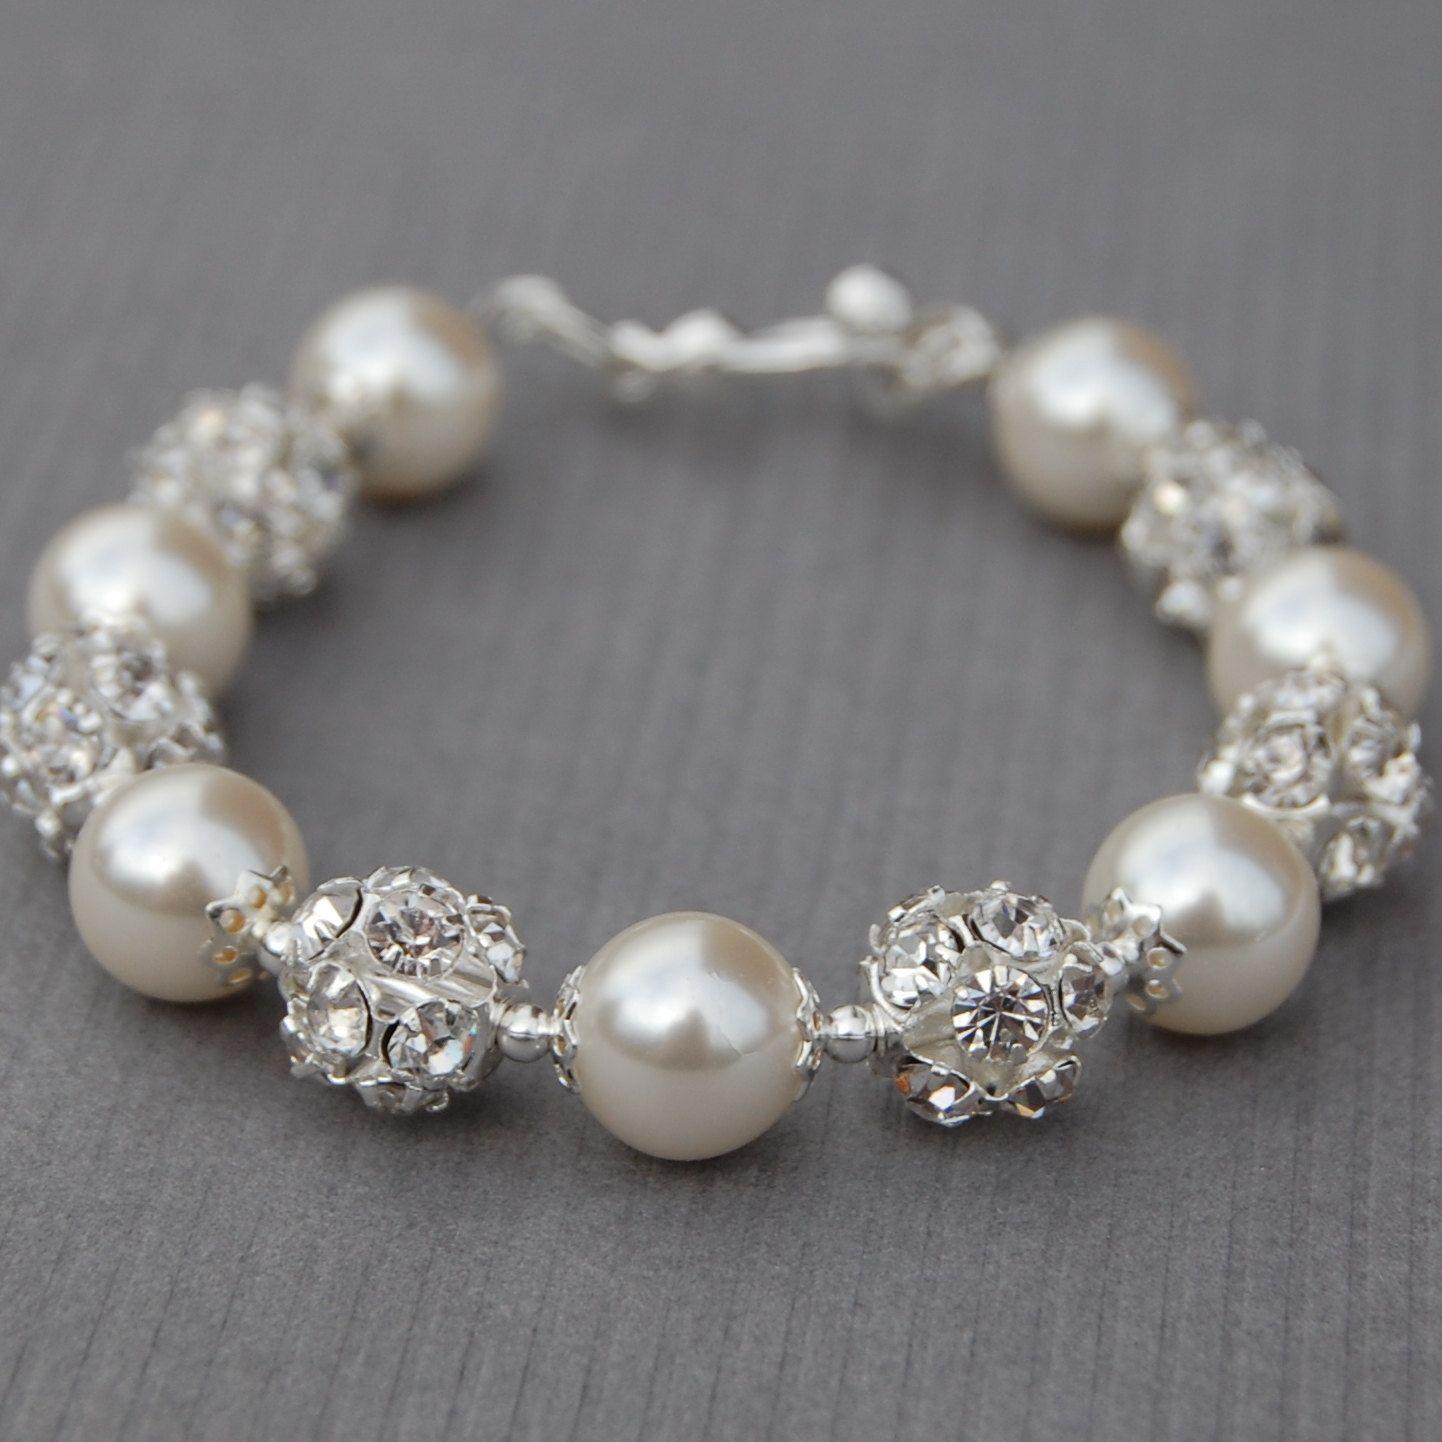 Best 25+ Wedding Jewelry Ideas On Pinterest